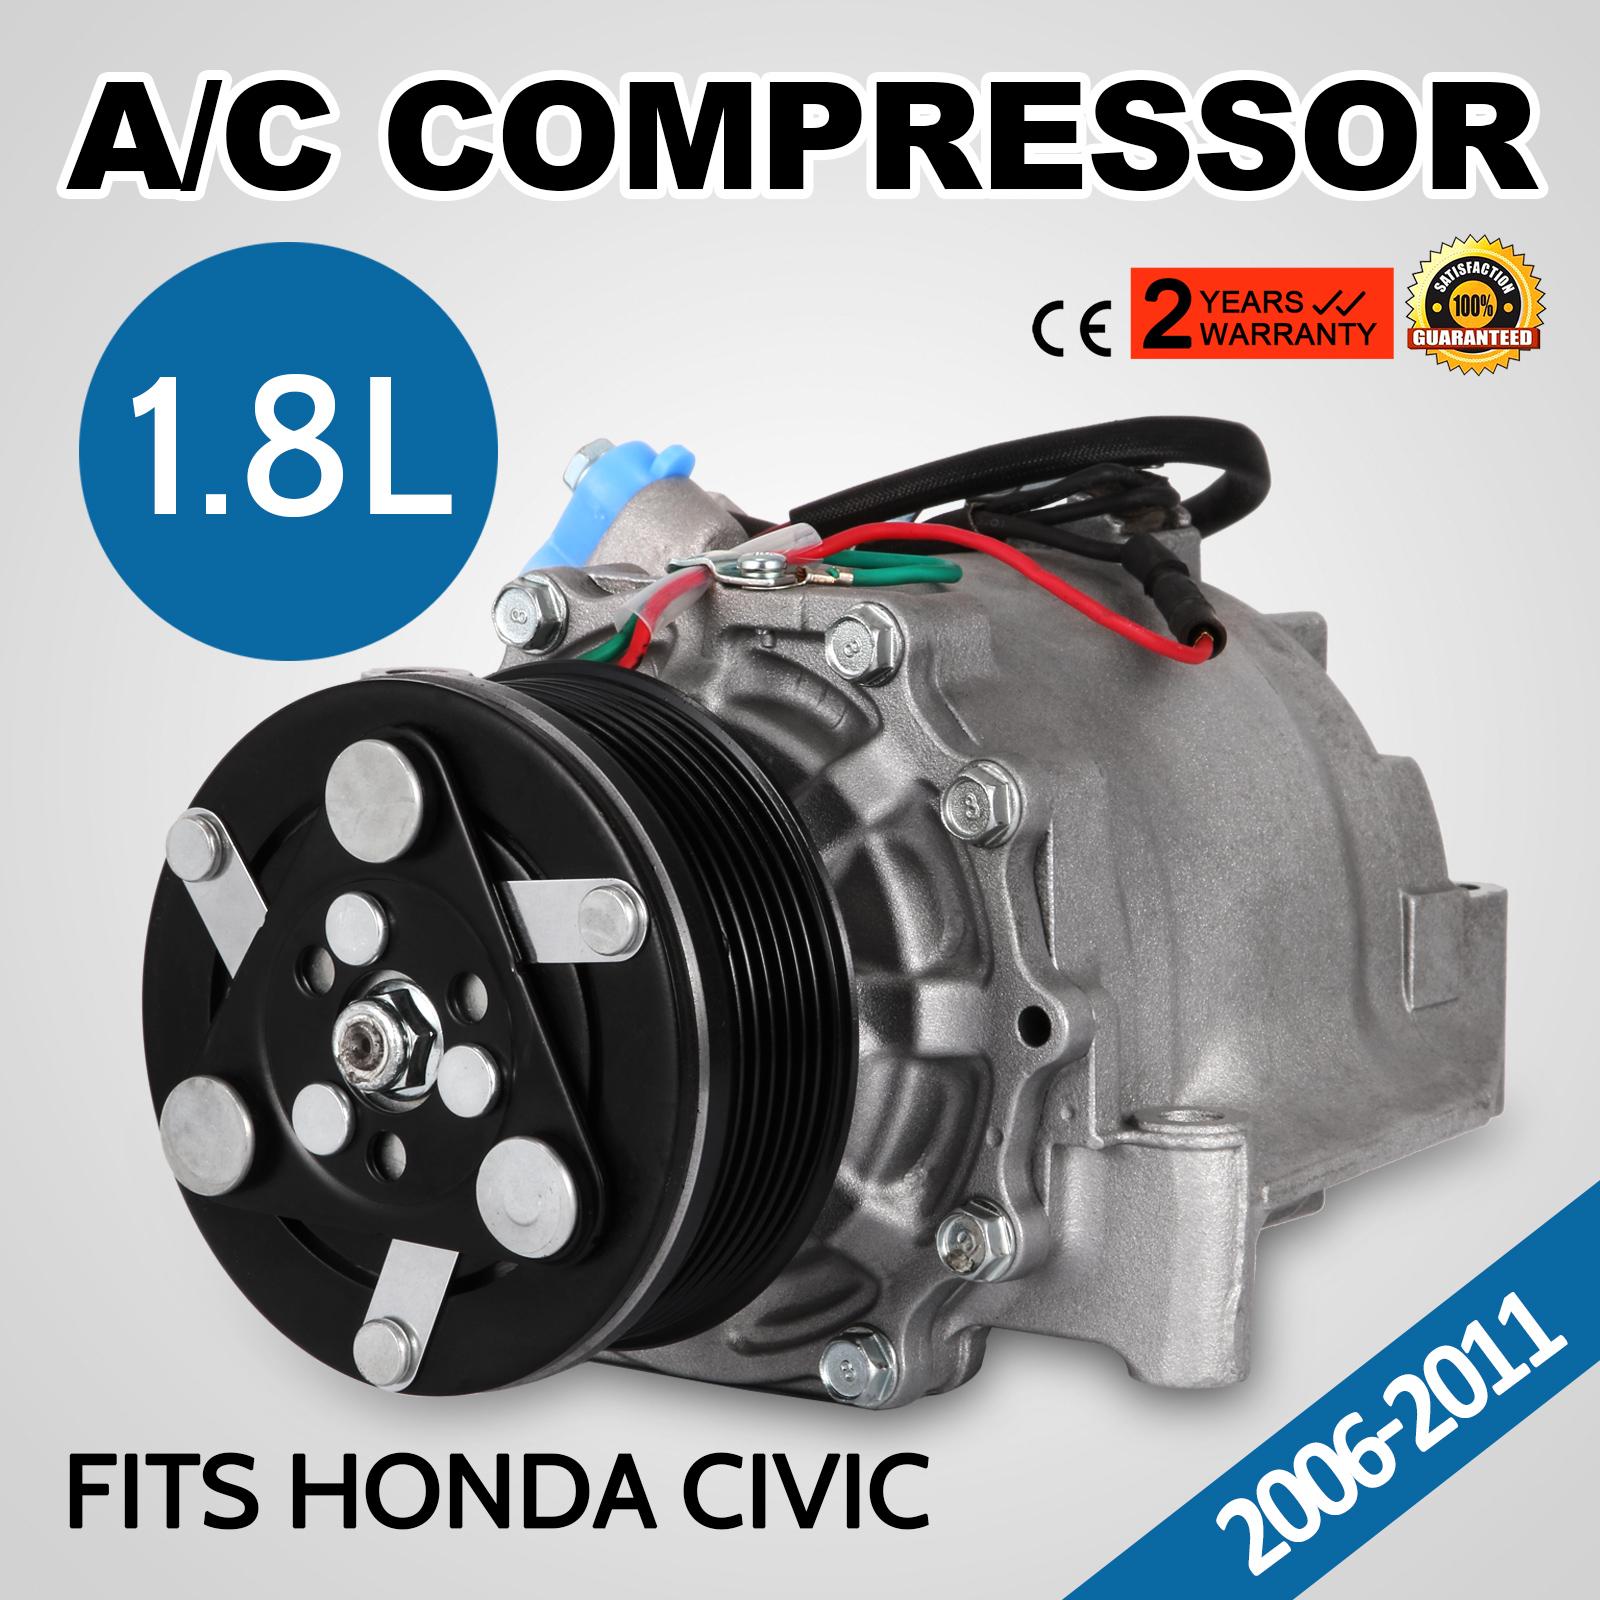 A//C AC Compressor Clutch Assembly Fits Honda Civic 2006-2011 L4 1.8L TRSE07